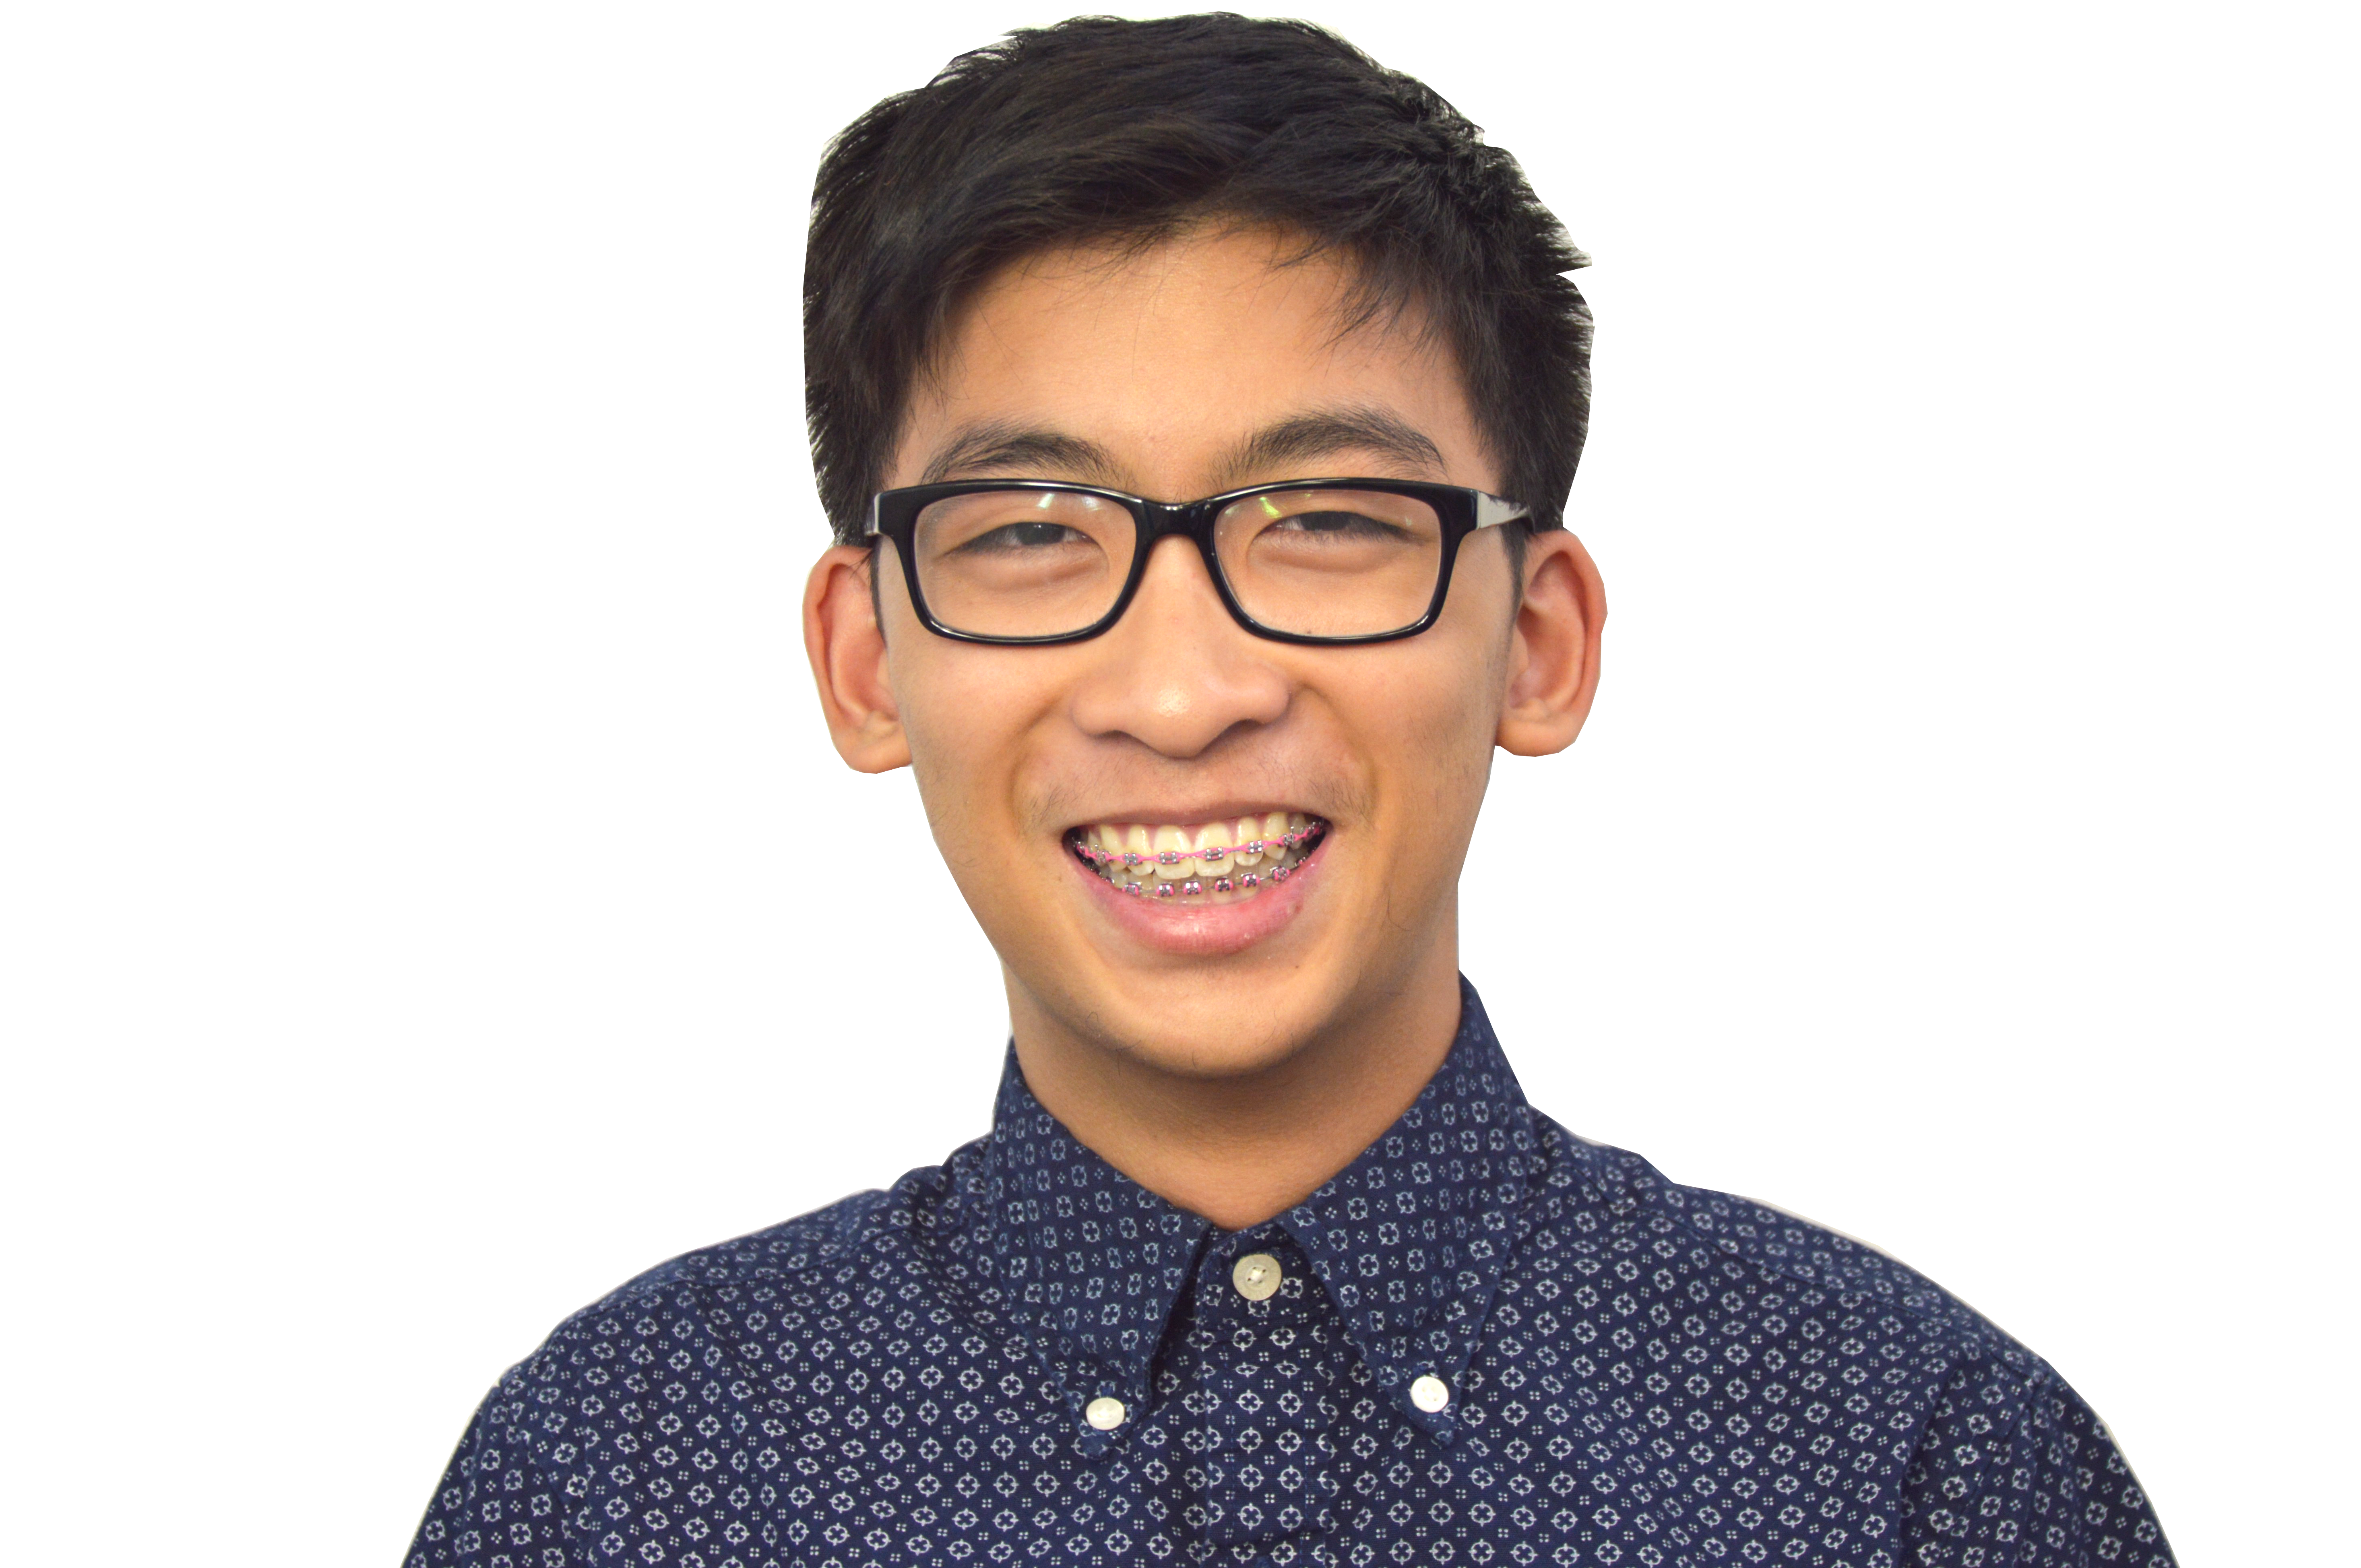 Michael Phung